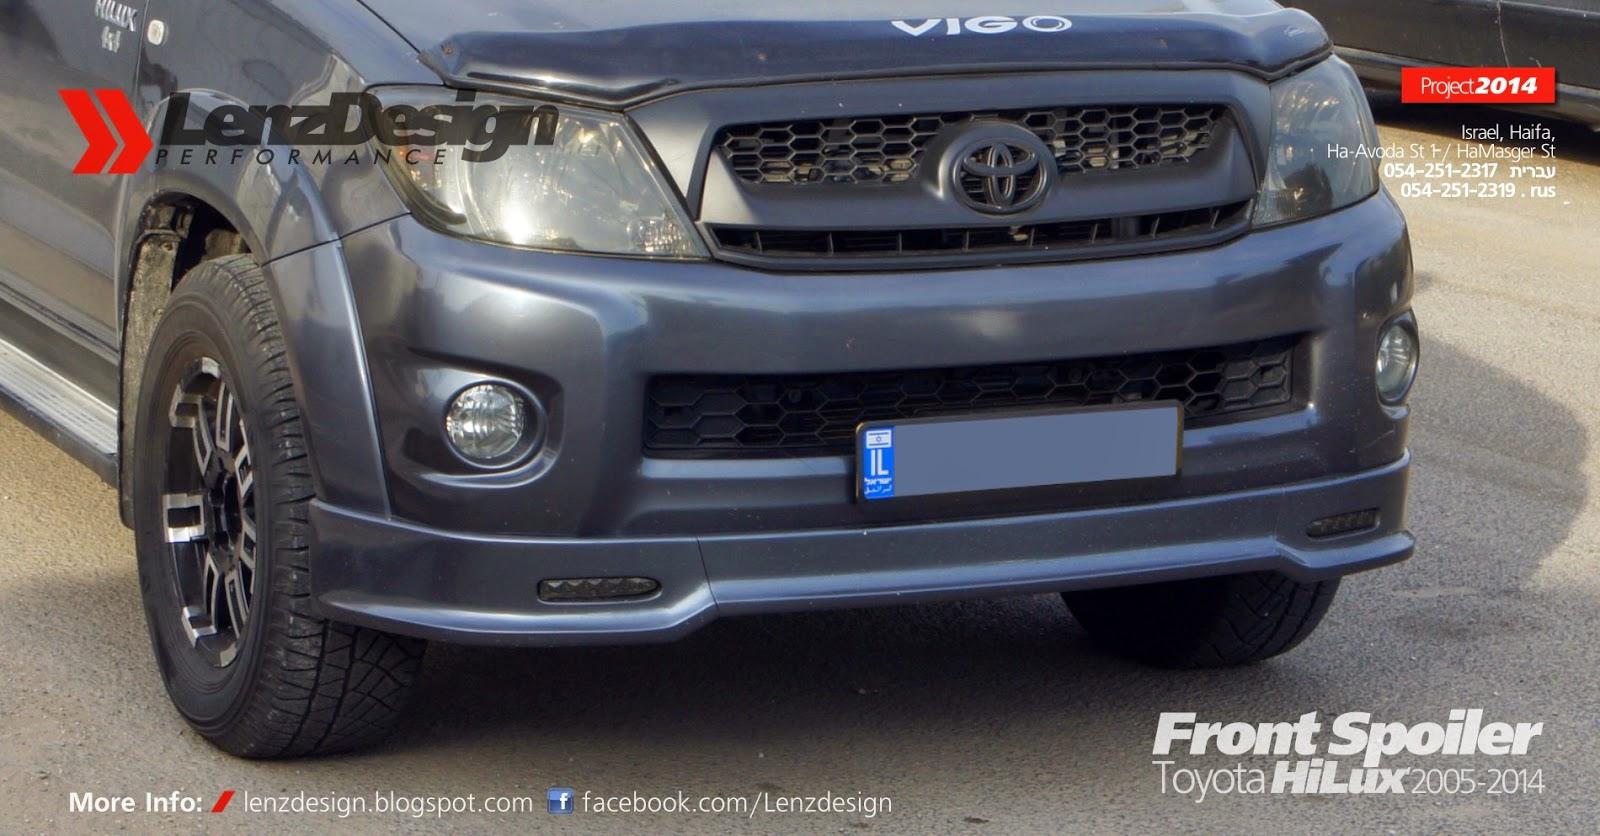 Toyota Hilux 2005 2014 Body Kit Lenzdesign Performance